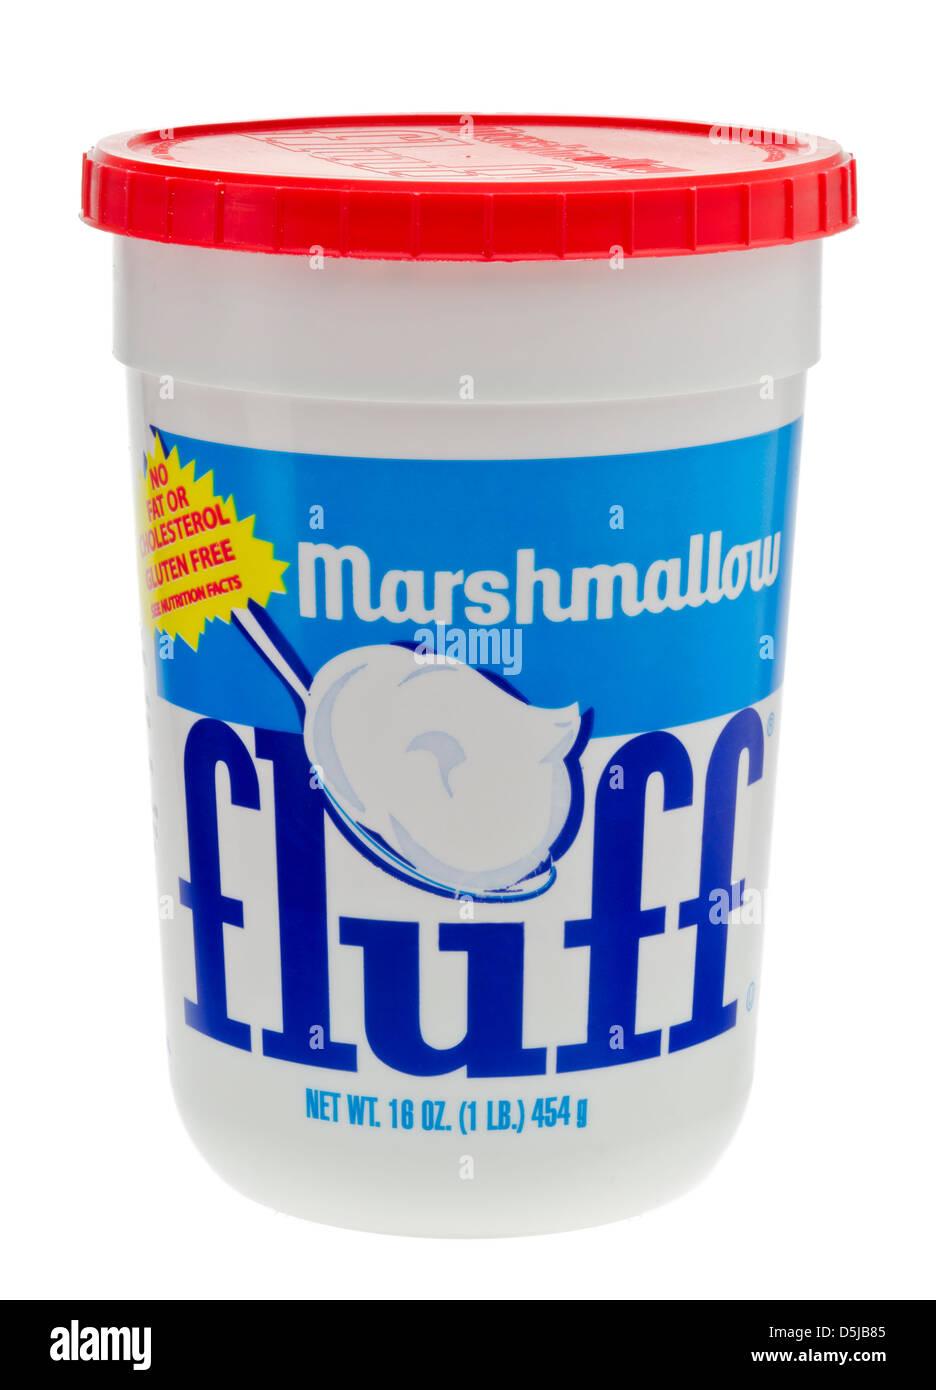 Tub of Marshmallow Fluff. - Stock Image